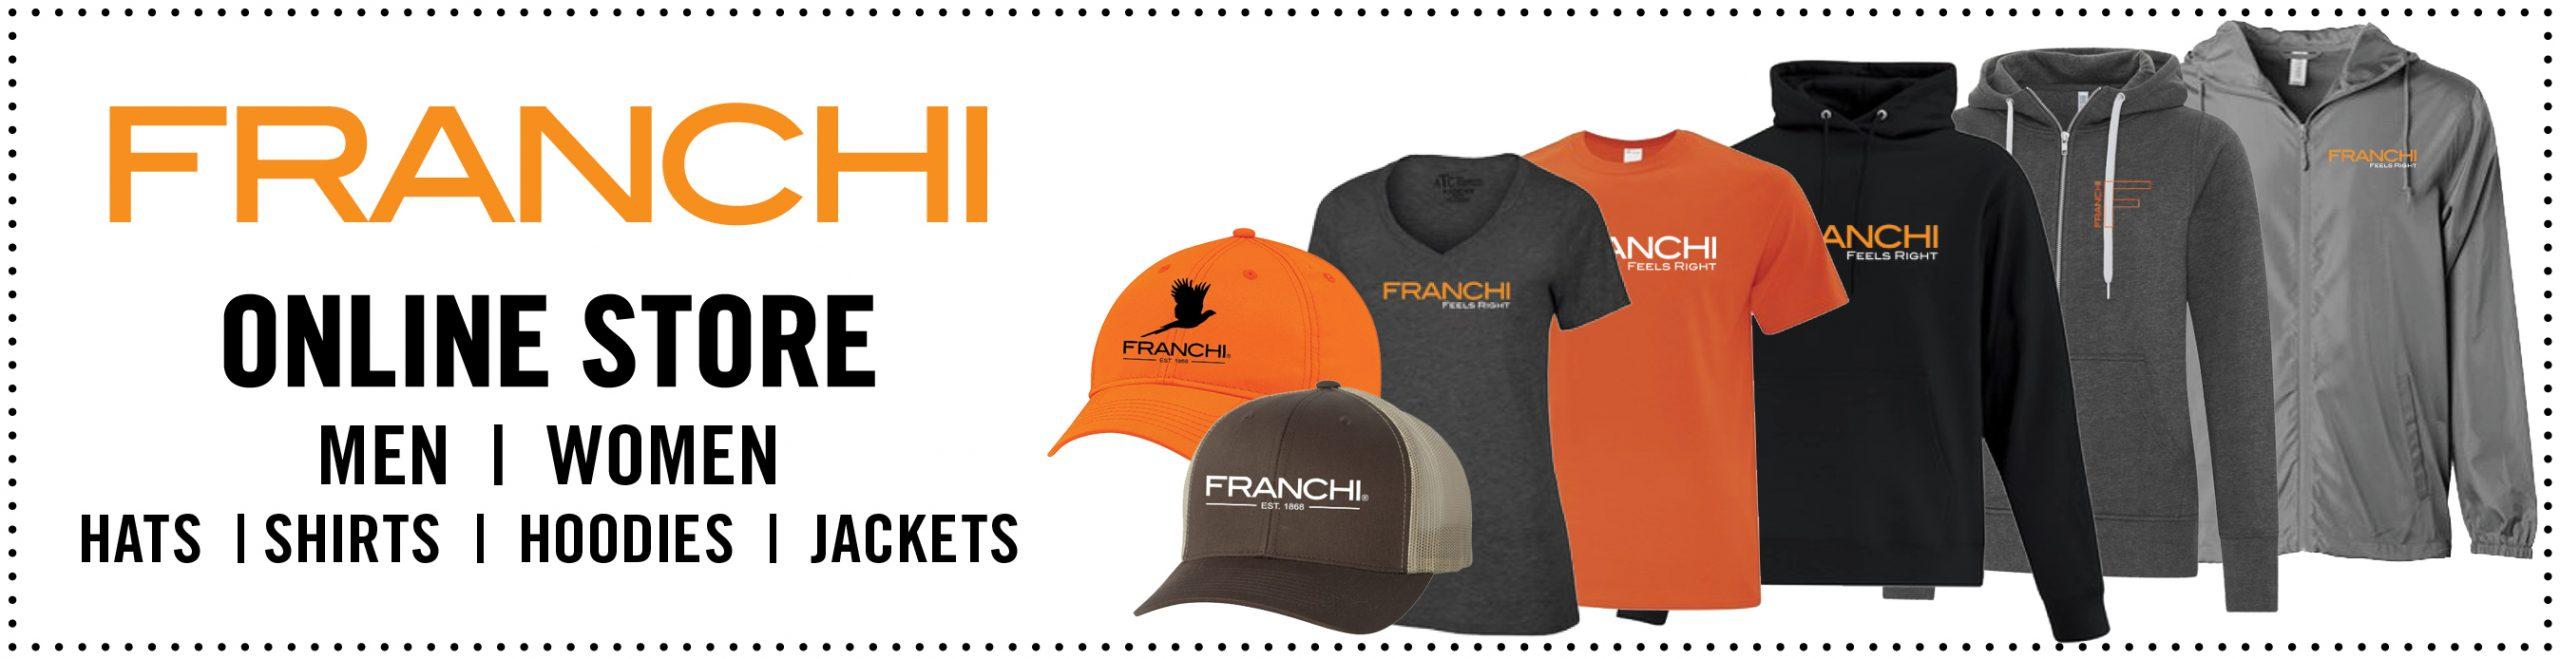 Franchi Canada Clothing